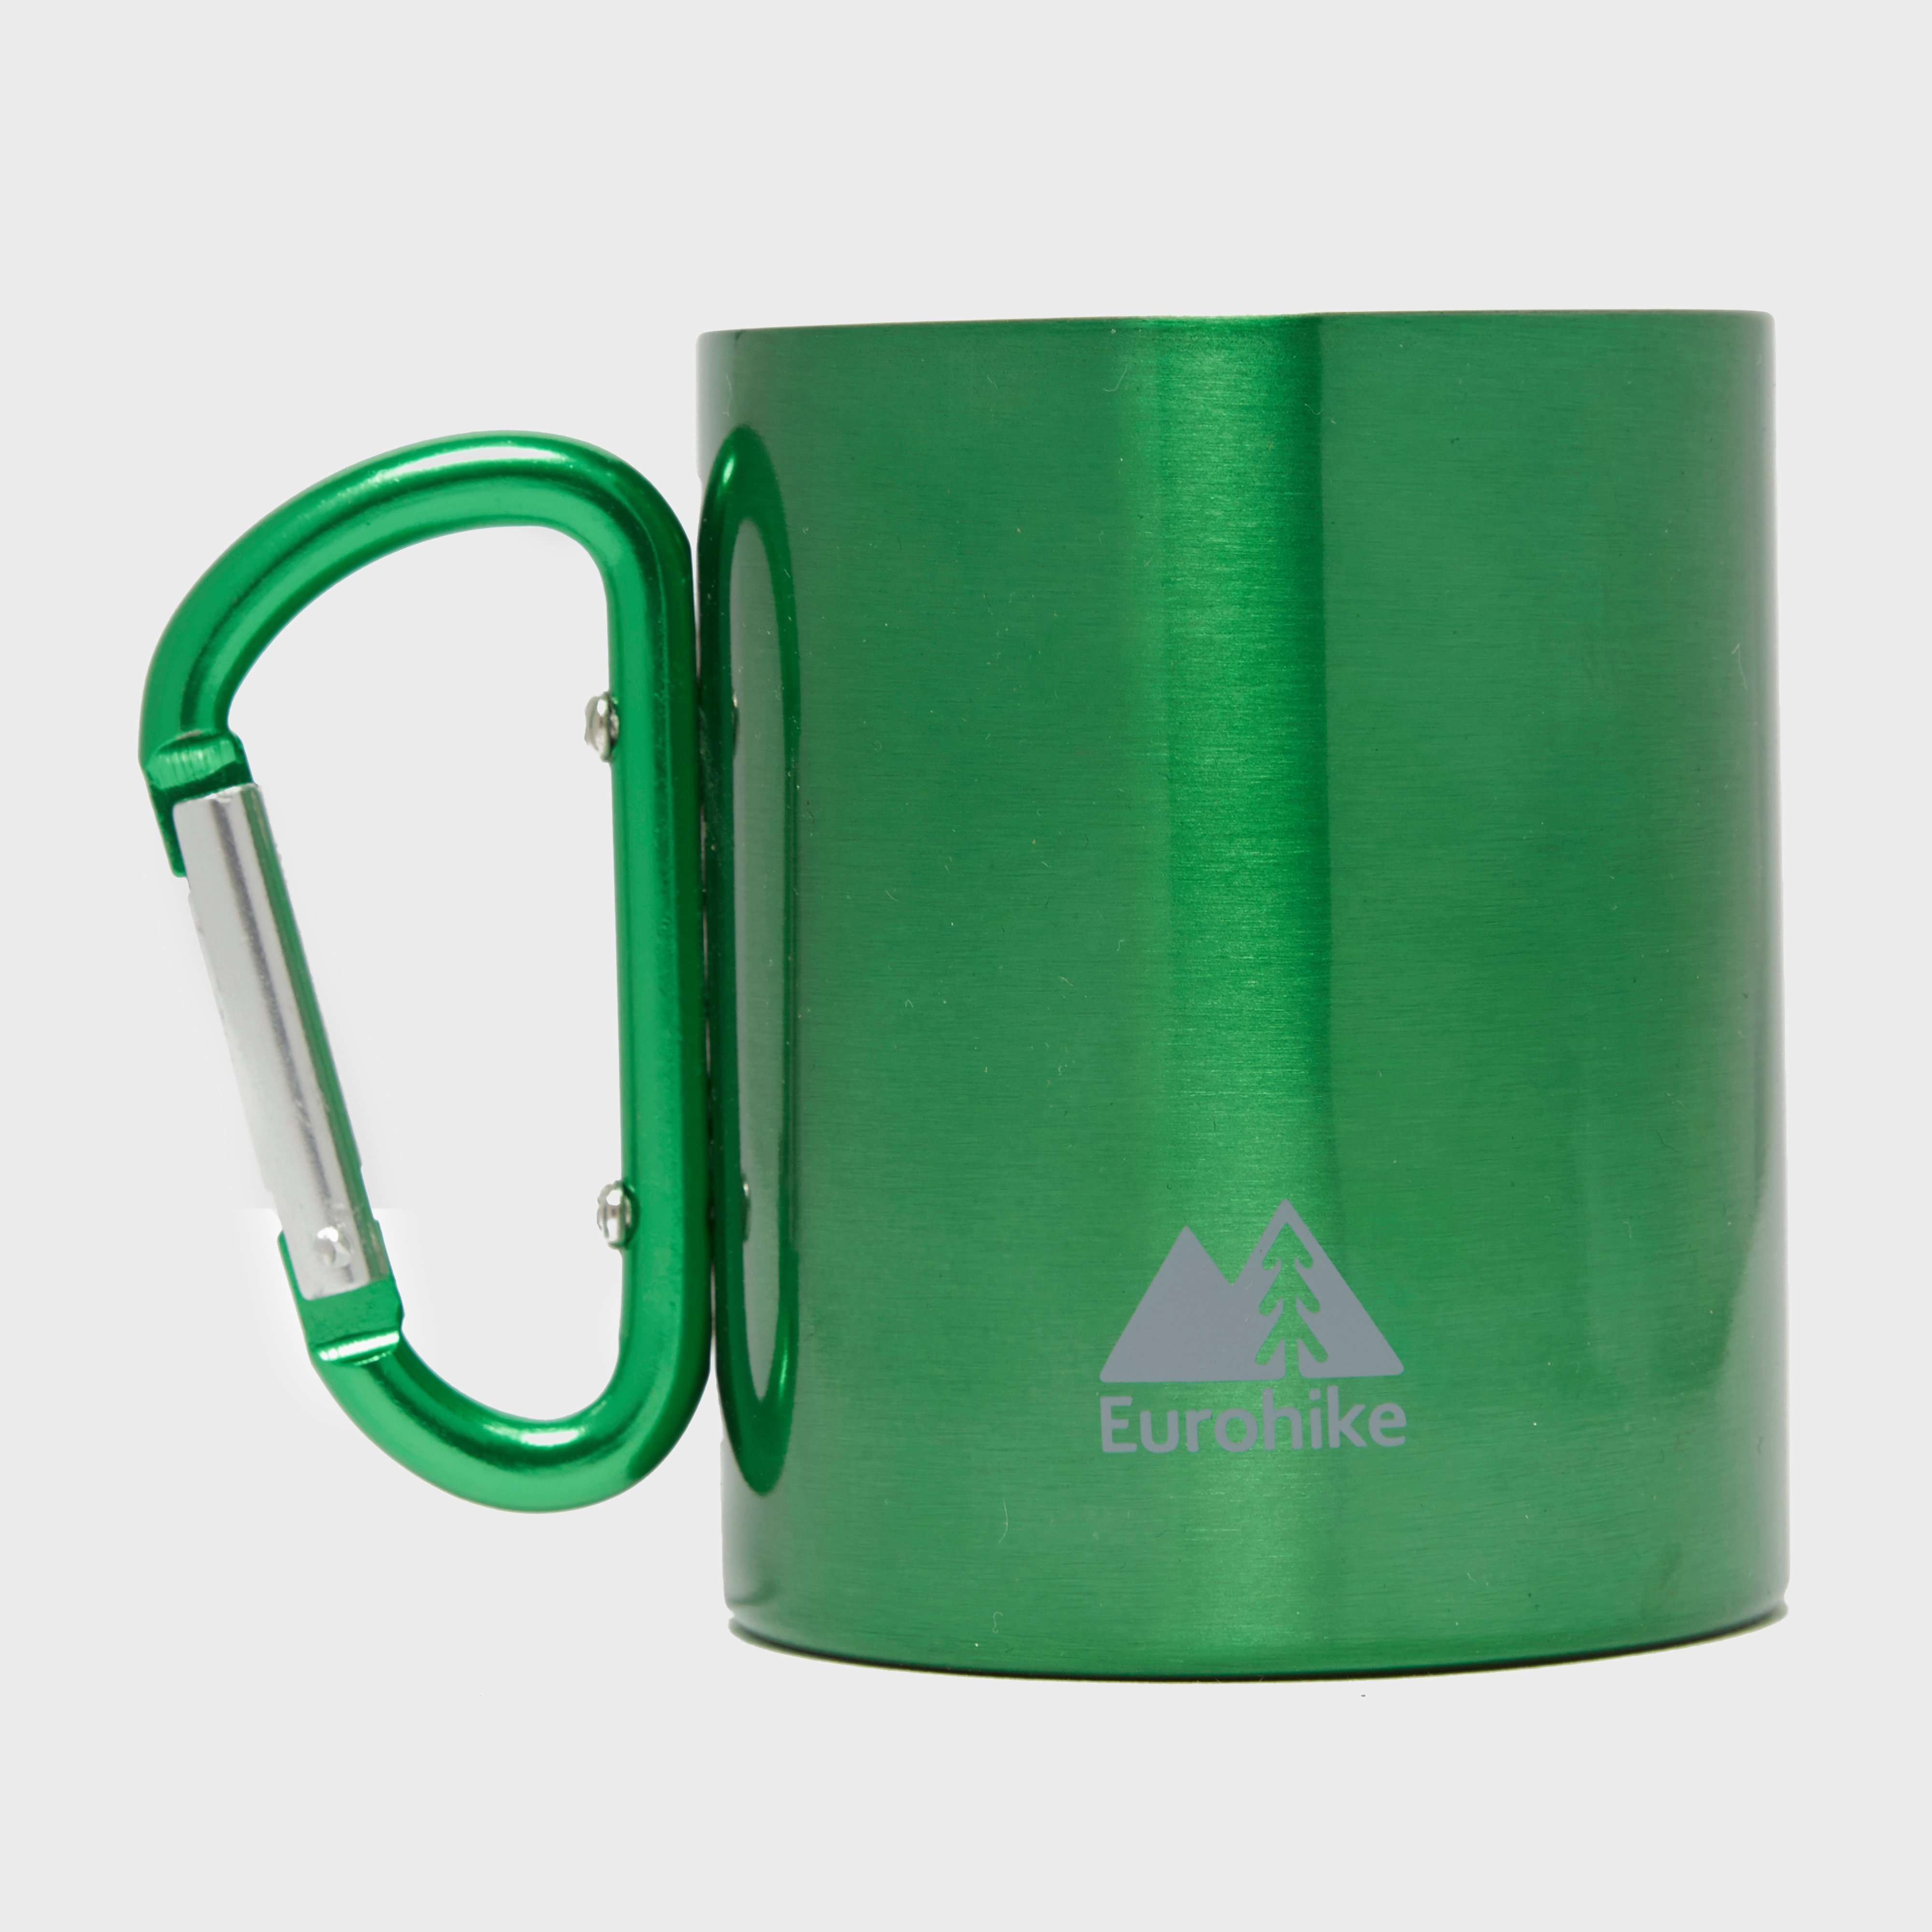 EUROHIKE Carabiner Mug